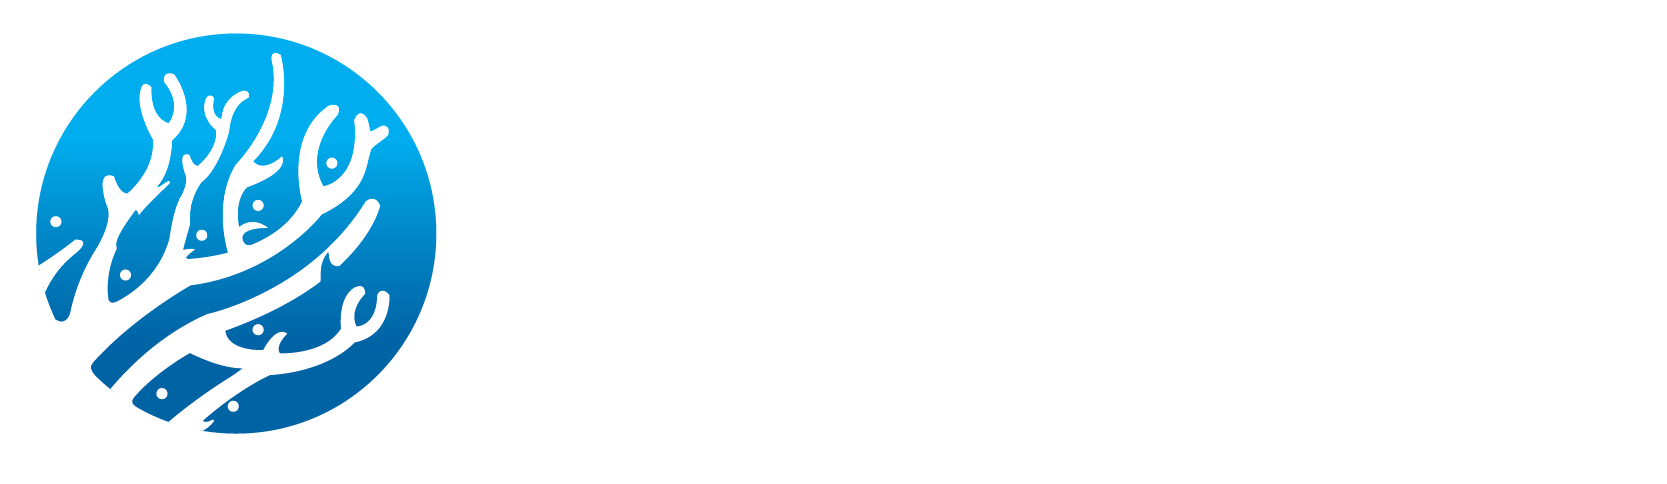 Noaa conservation program crcp. Clipart ocean coral reef ecosystem